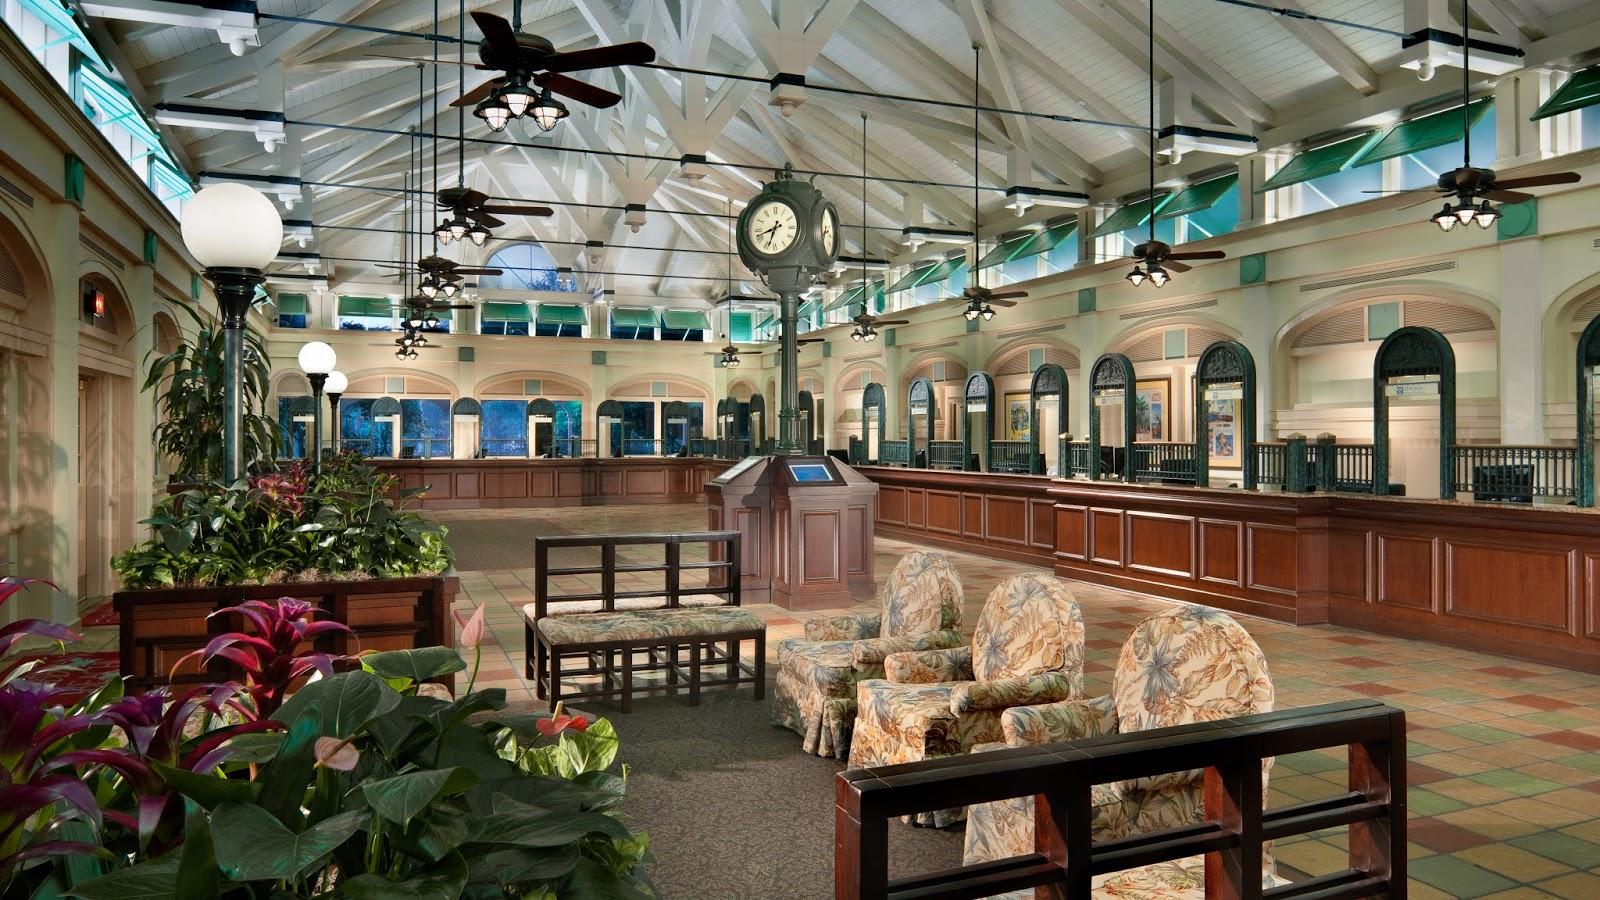 Rmh Travel Disney S Caribbean Beach Resort A Look Inside